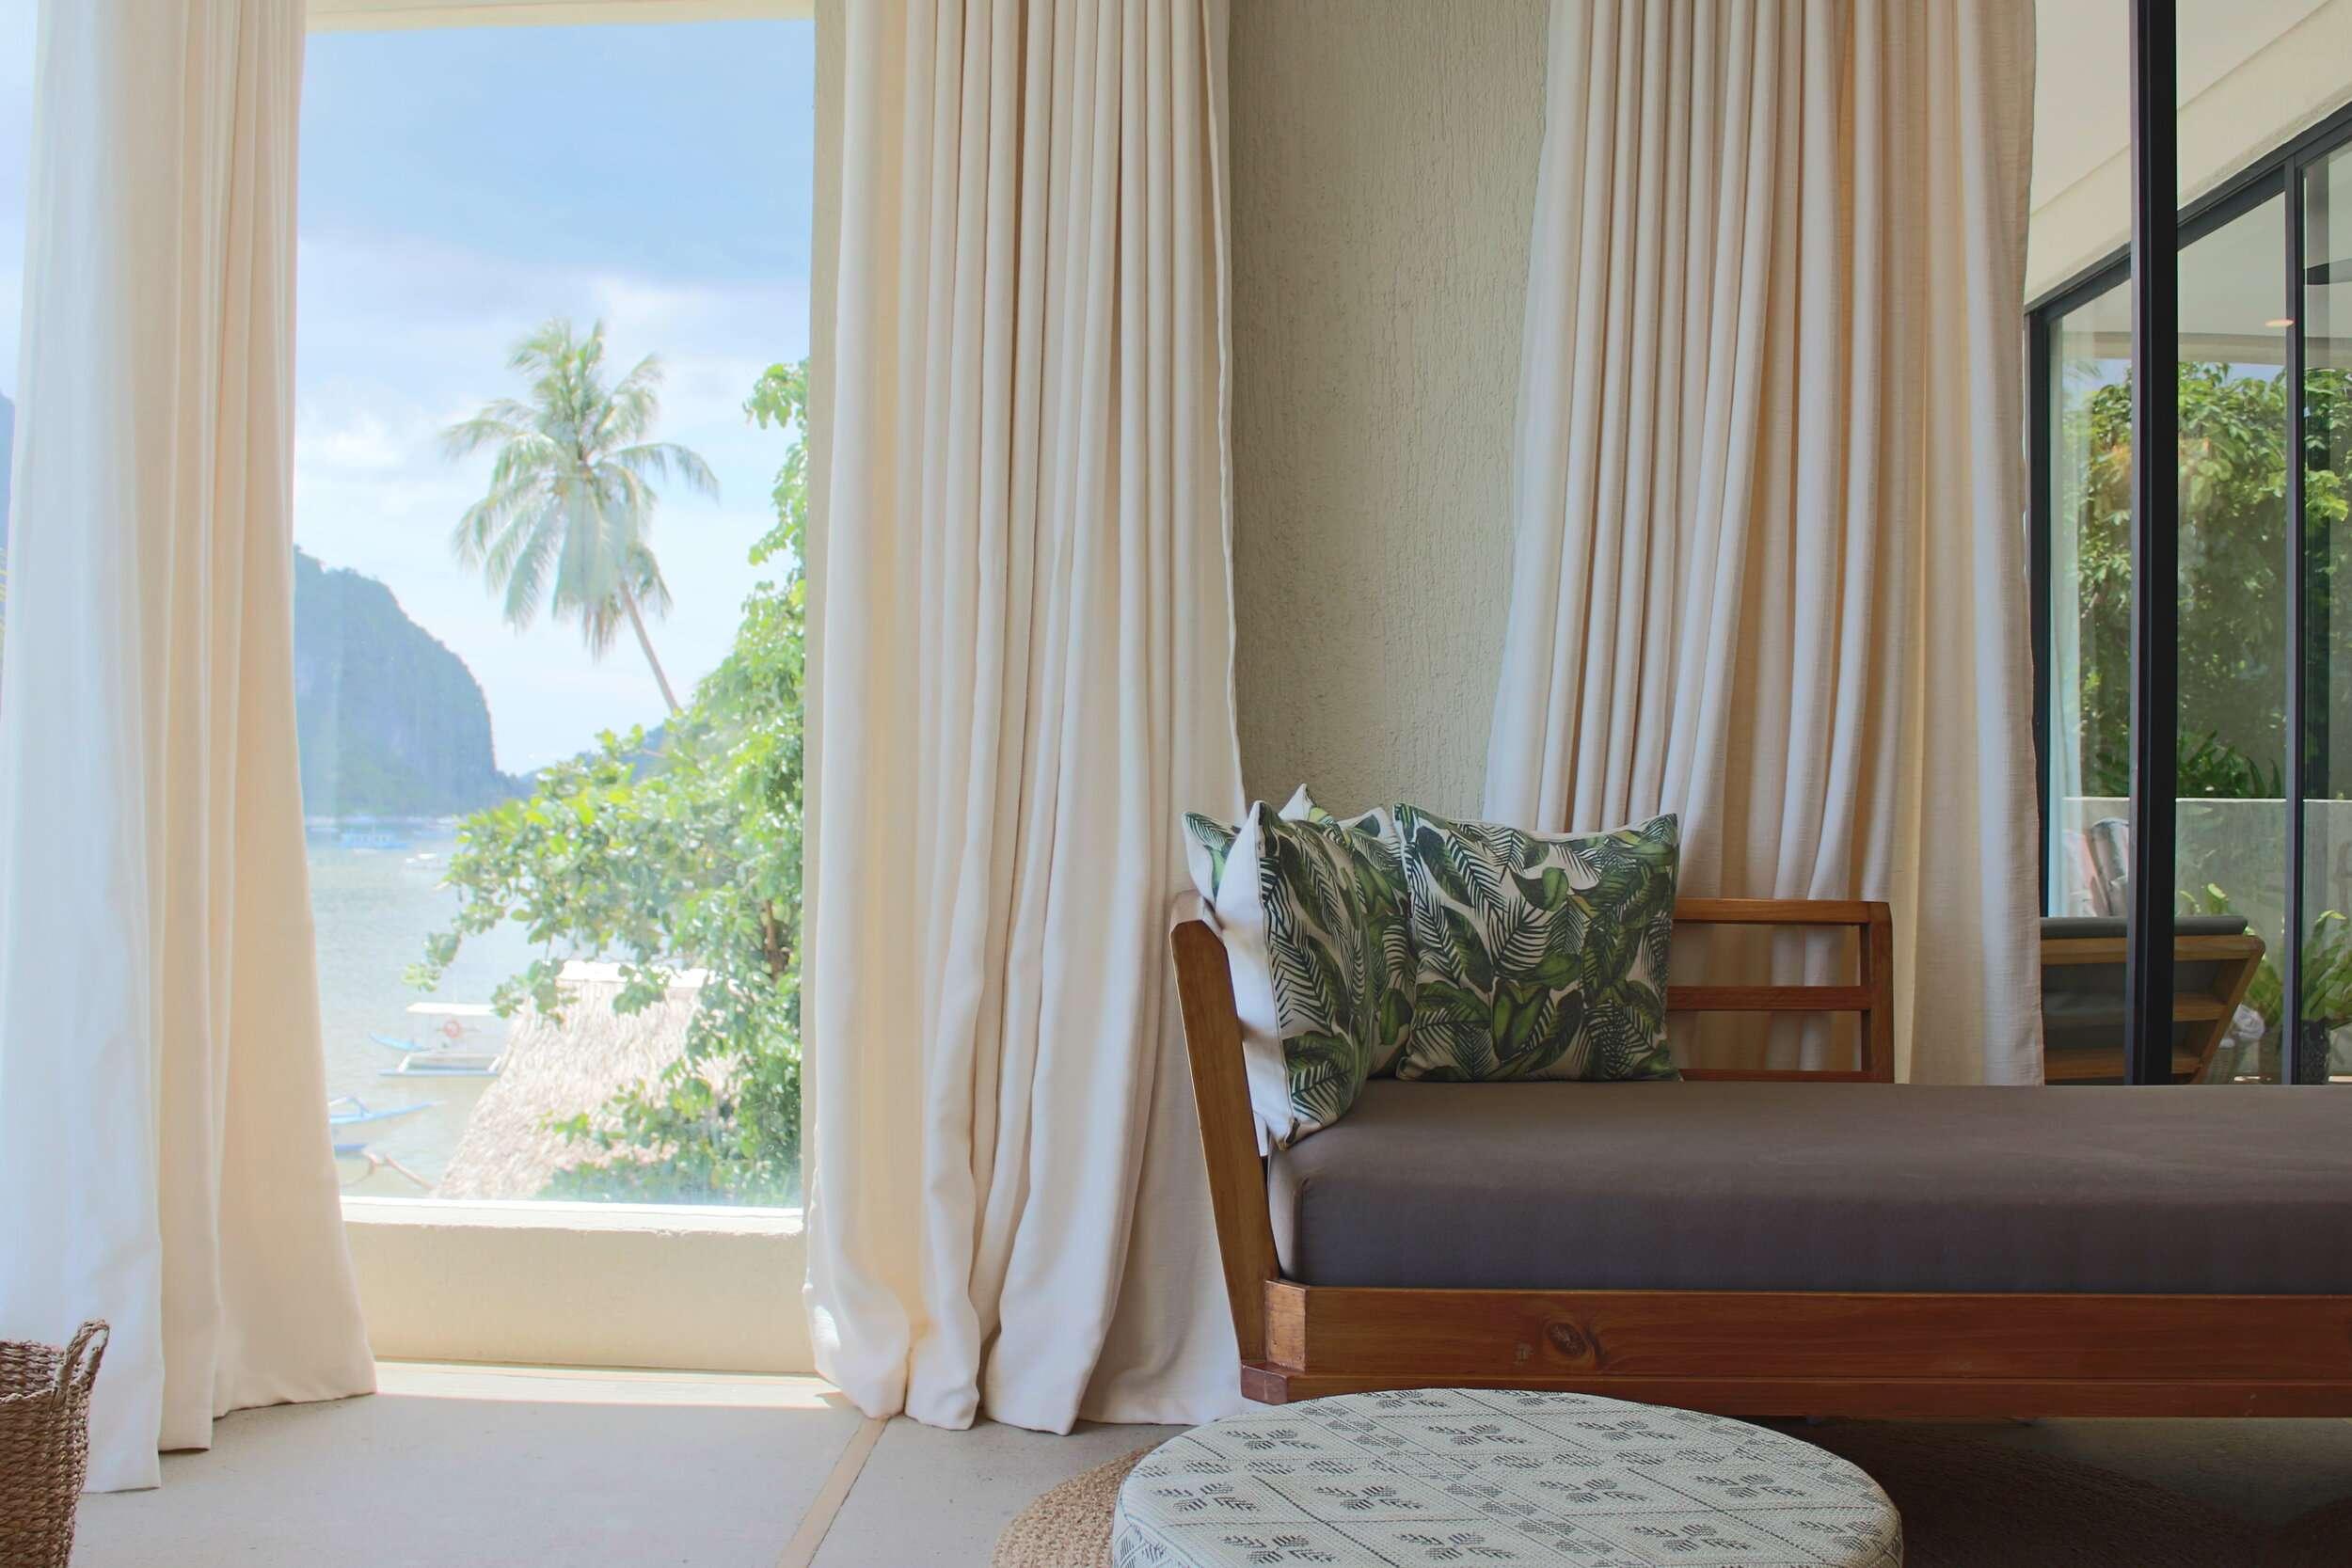 Frangipani El Nido Lounge Suite